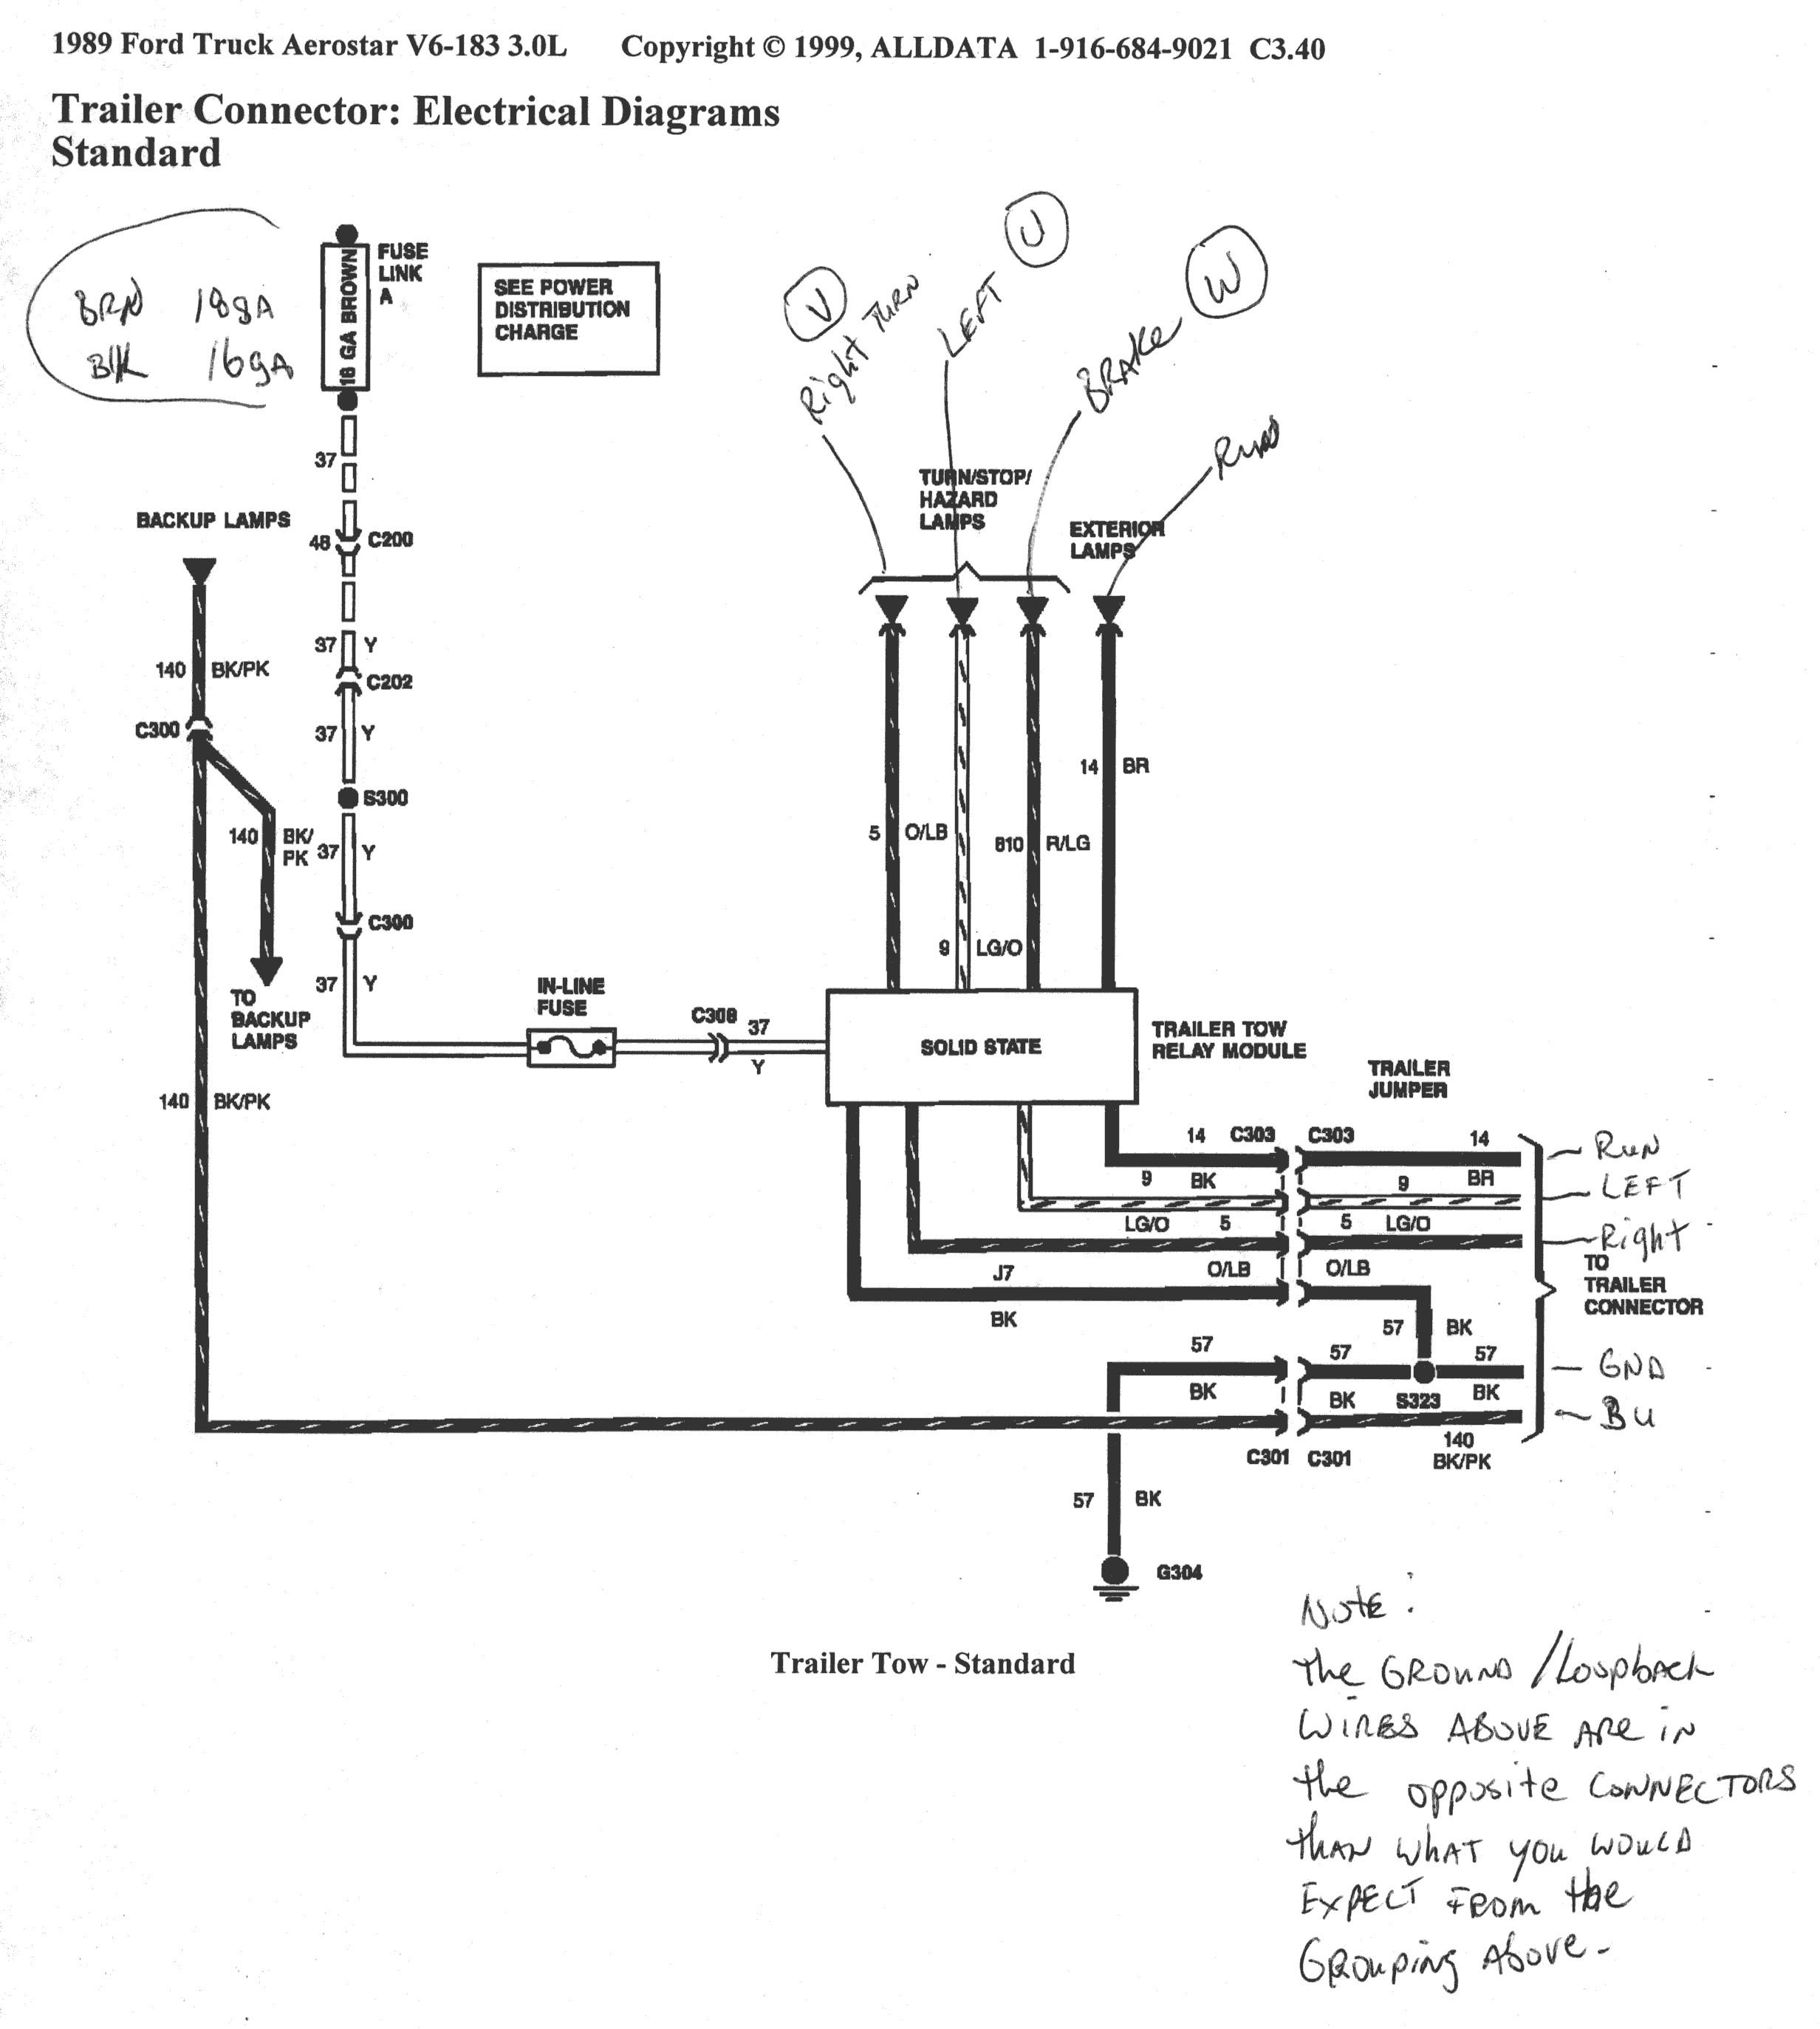 Ford Escape Parts Diagram Escape Oxygen Sensor Location Besides Silverado Trailer Wiring Of Ford Escape Parts Diagram